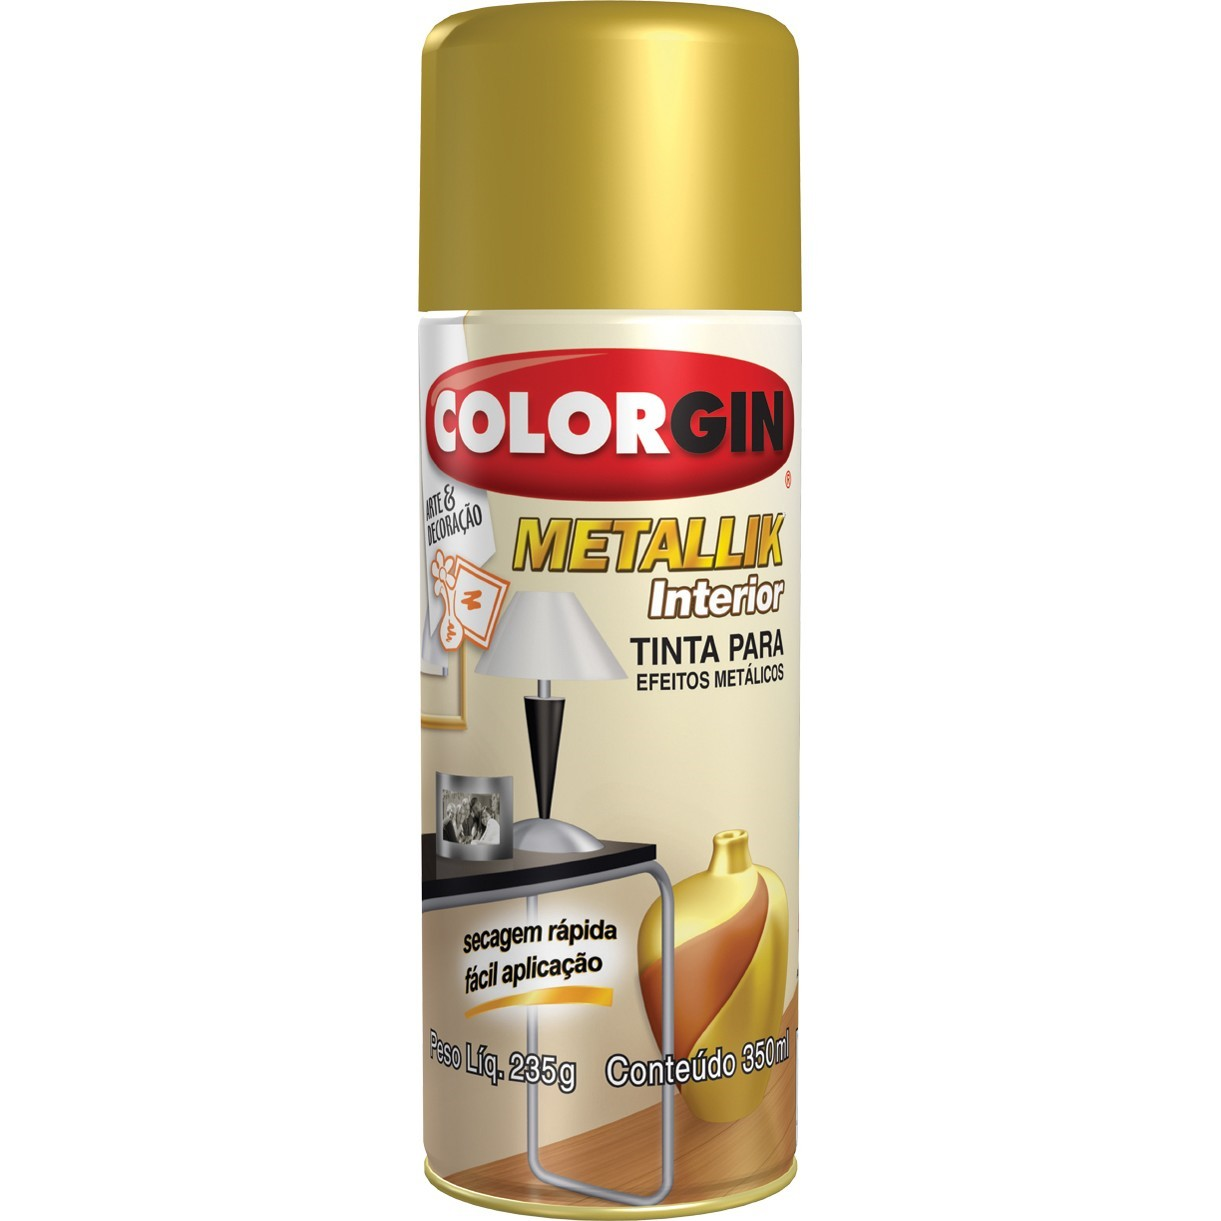 Tinta Spray Metalico Metallik Interno - Cromado - 350ml - Colorgin